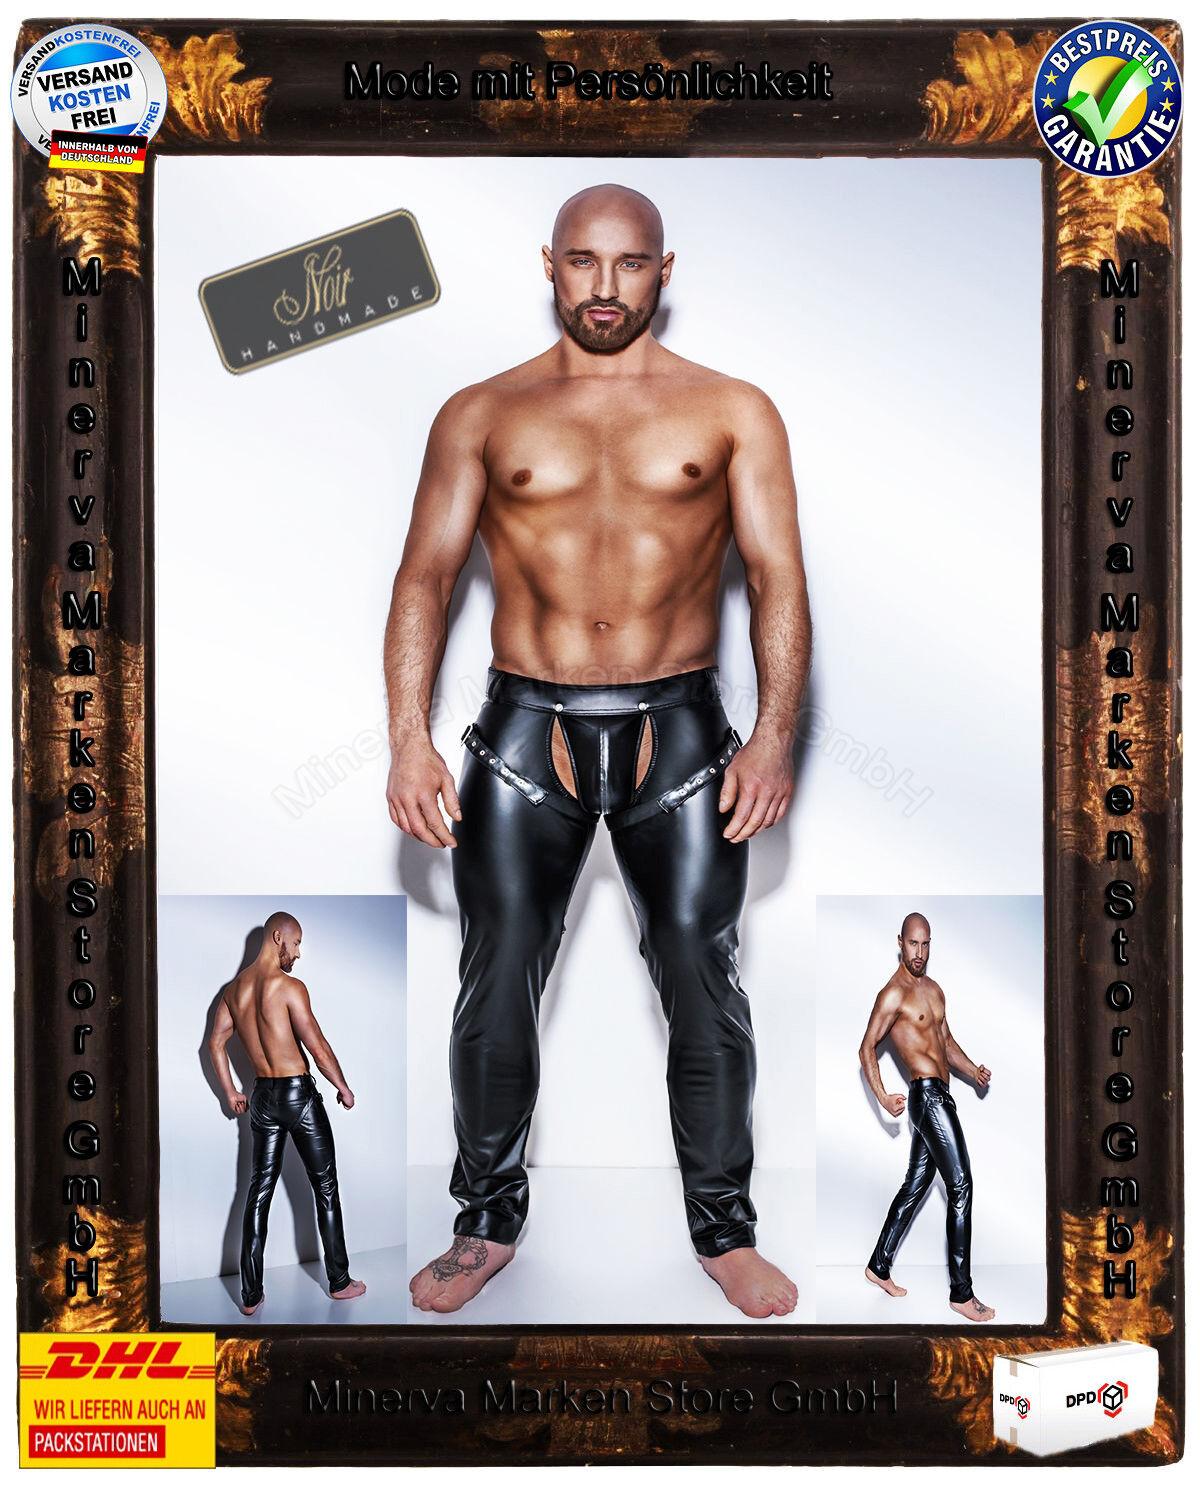 schwarz Handmade schwarze Powerwetlook H042 Hose Harness Clubwear GoGo Gay Gothic